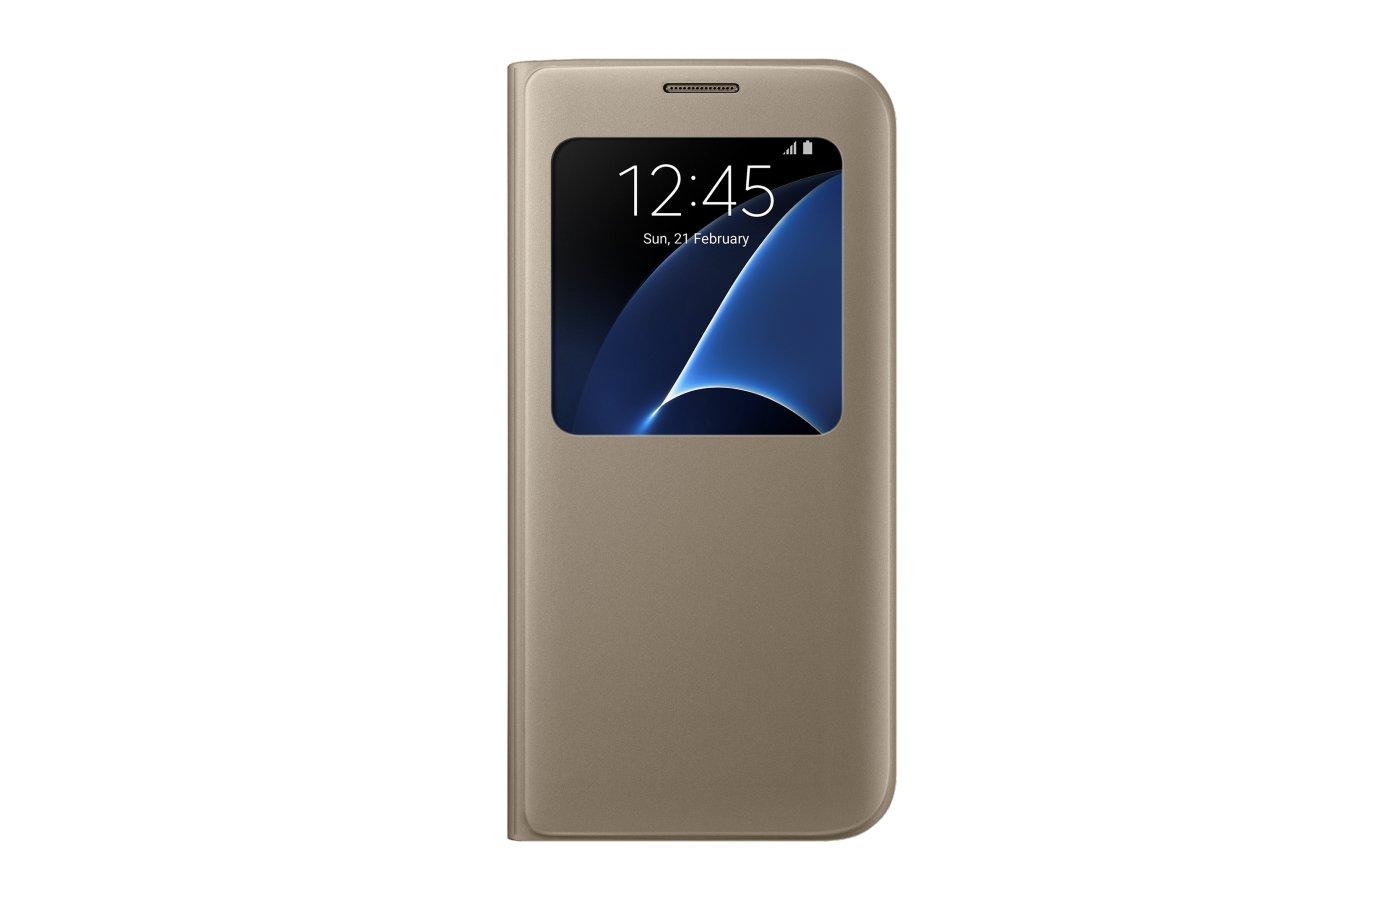 Чехол Samsung S-View для Galaxy S7 Edge (SM-G935) (EF-CG935PFEGRU) золотой